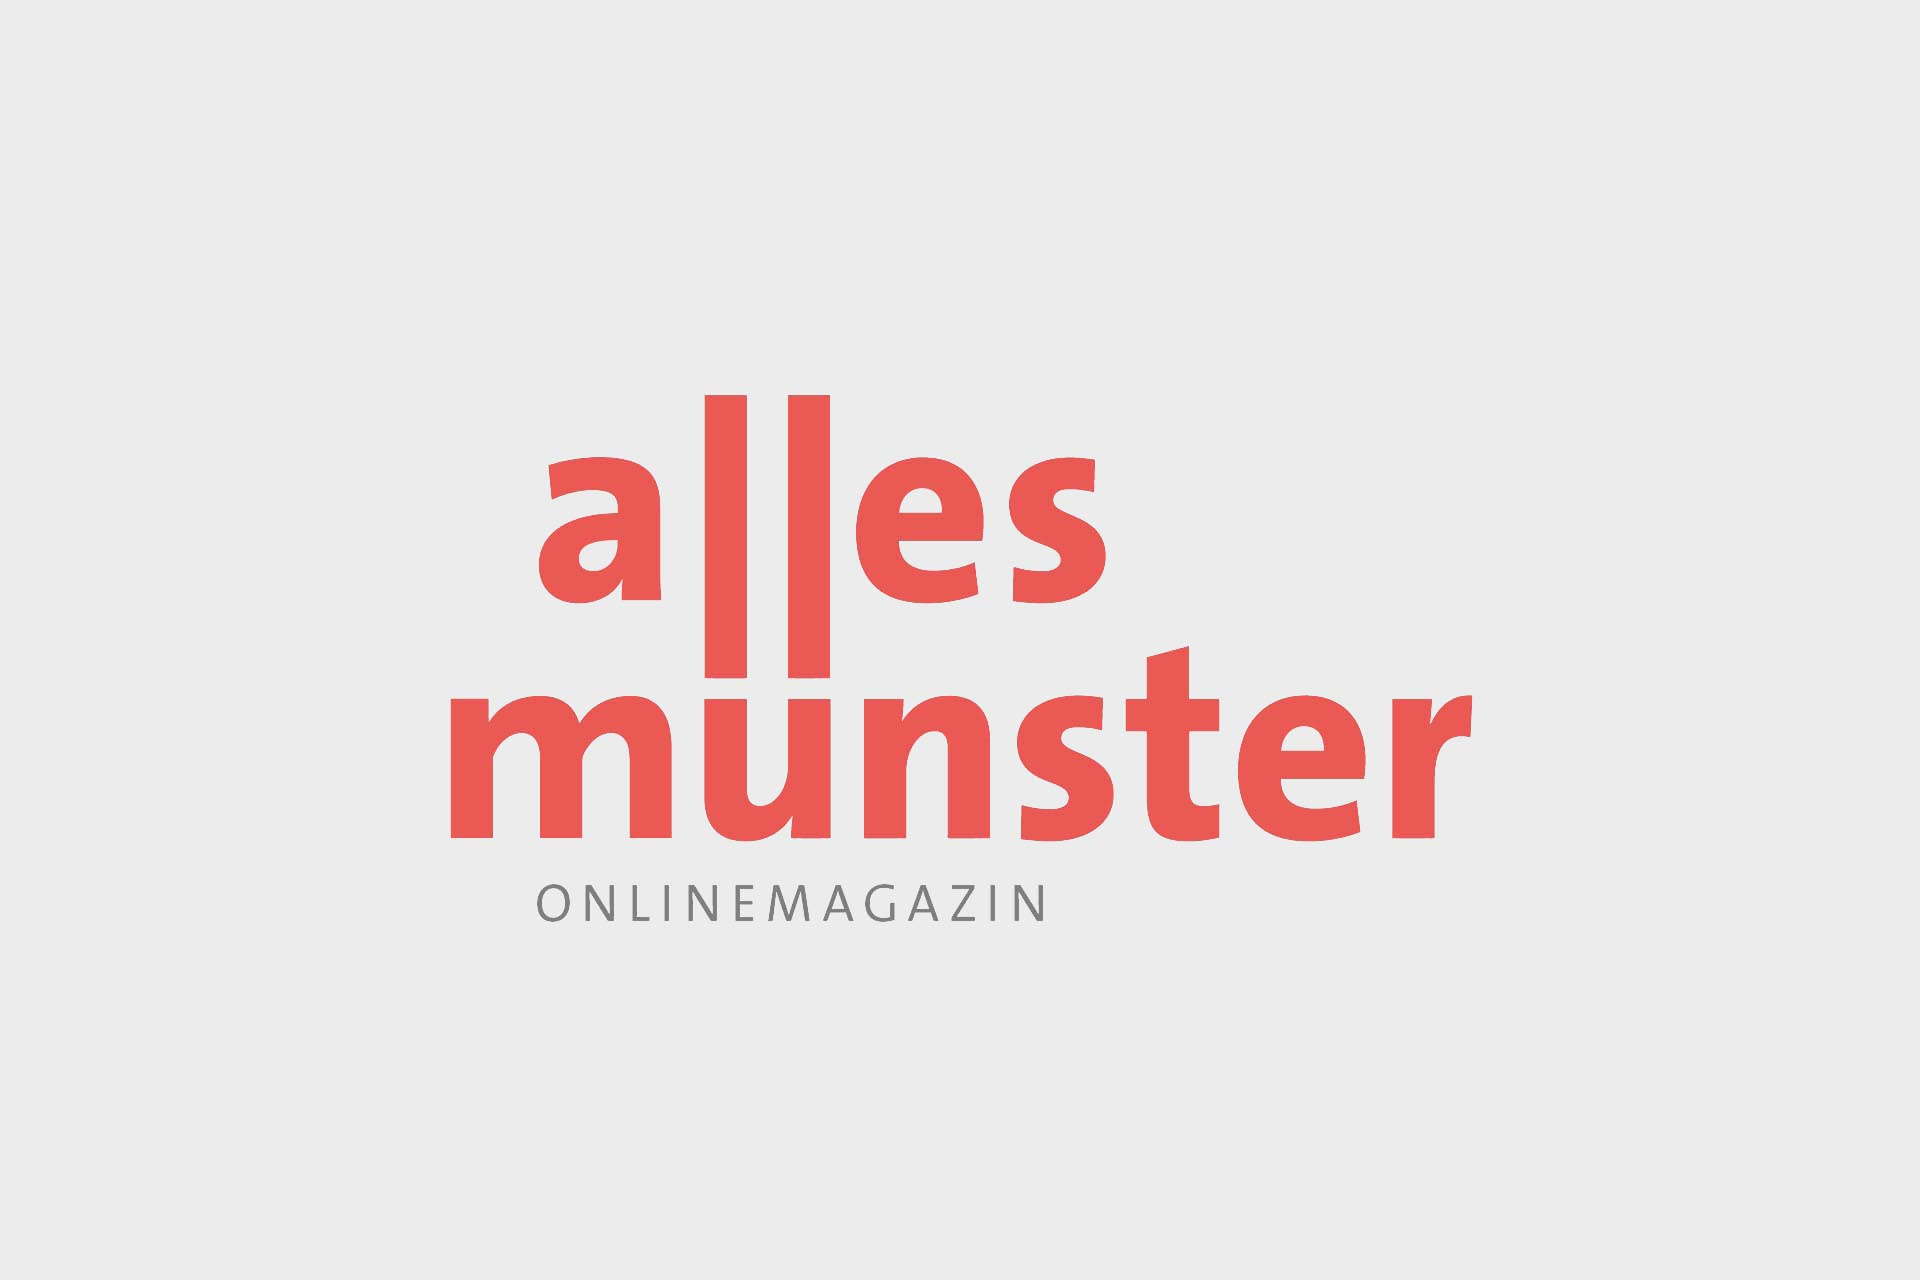 Logo-Design, Alles-Münster, Design, Logo, Münster, Grafik, Studio, Auckz